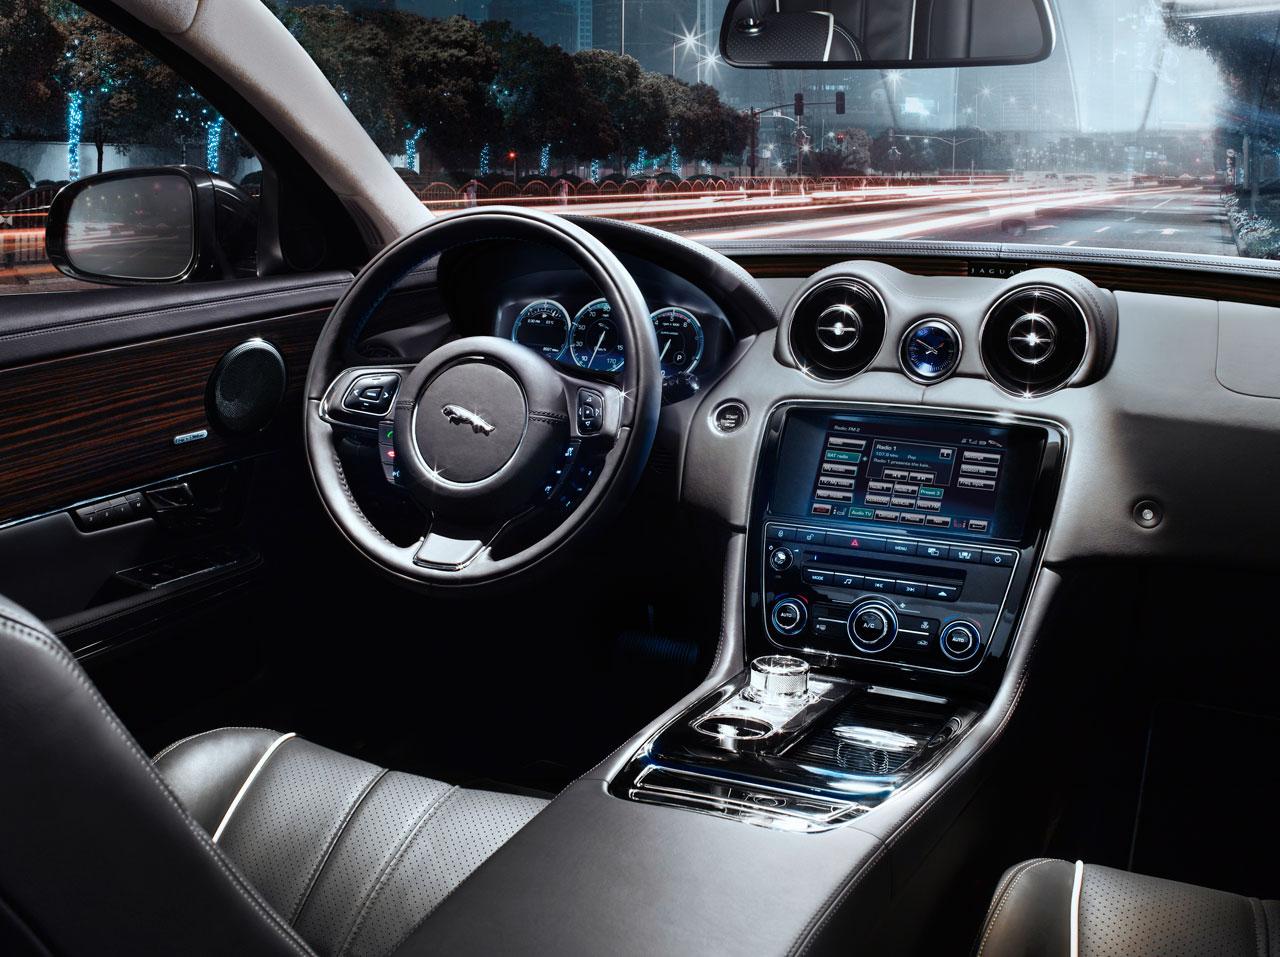 JAGUAR XJ 4.2 interior